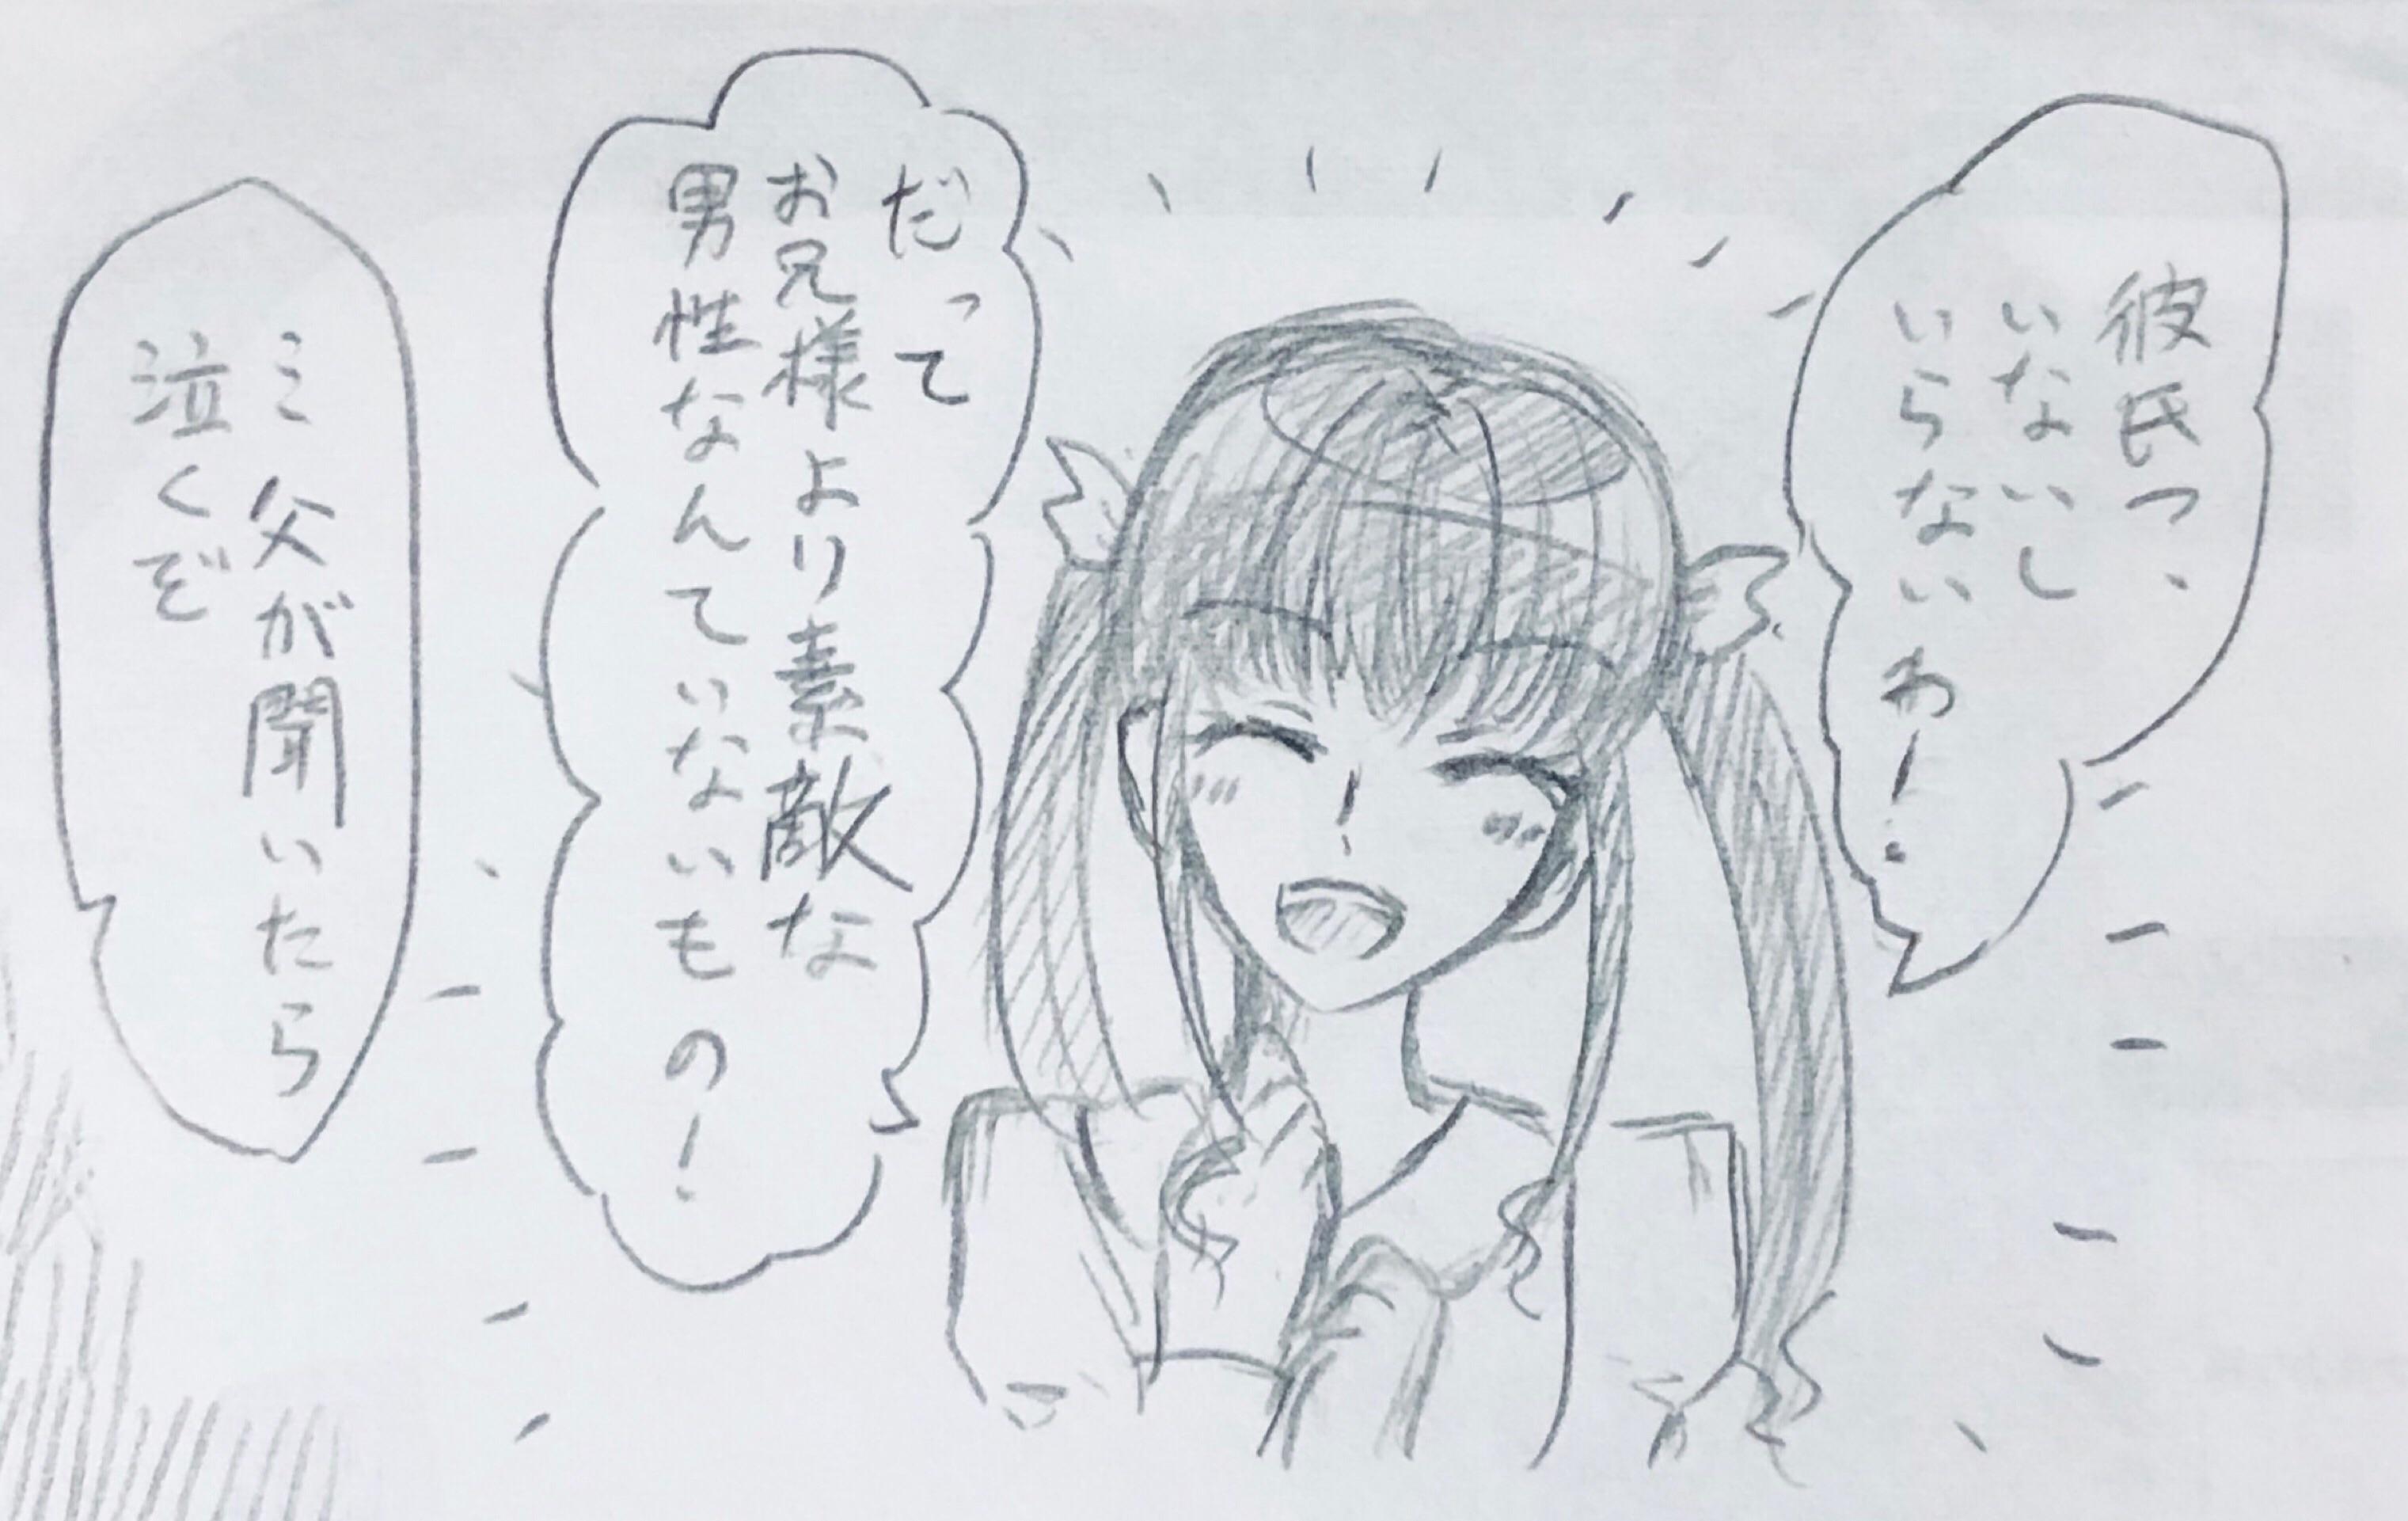 f:id:Yuki-19:20201009115631j:image